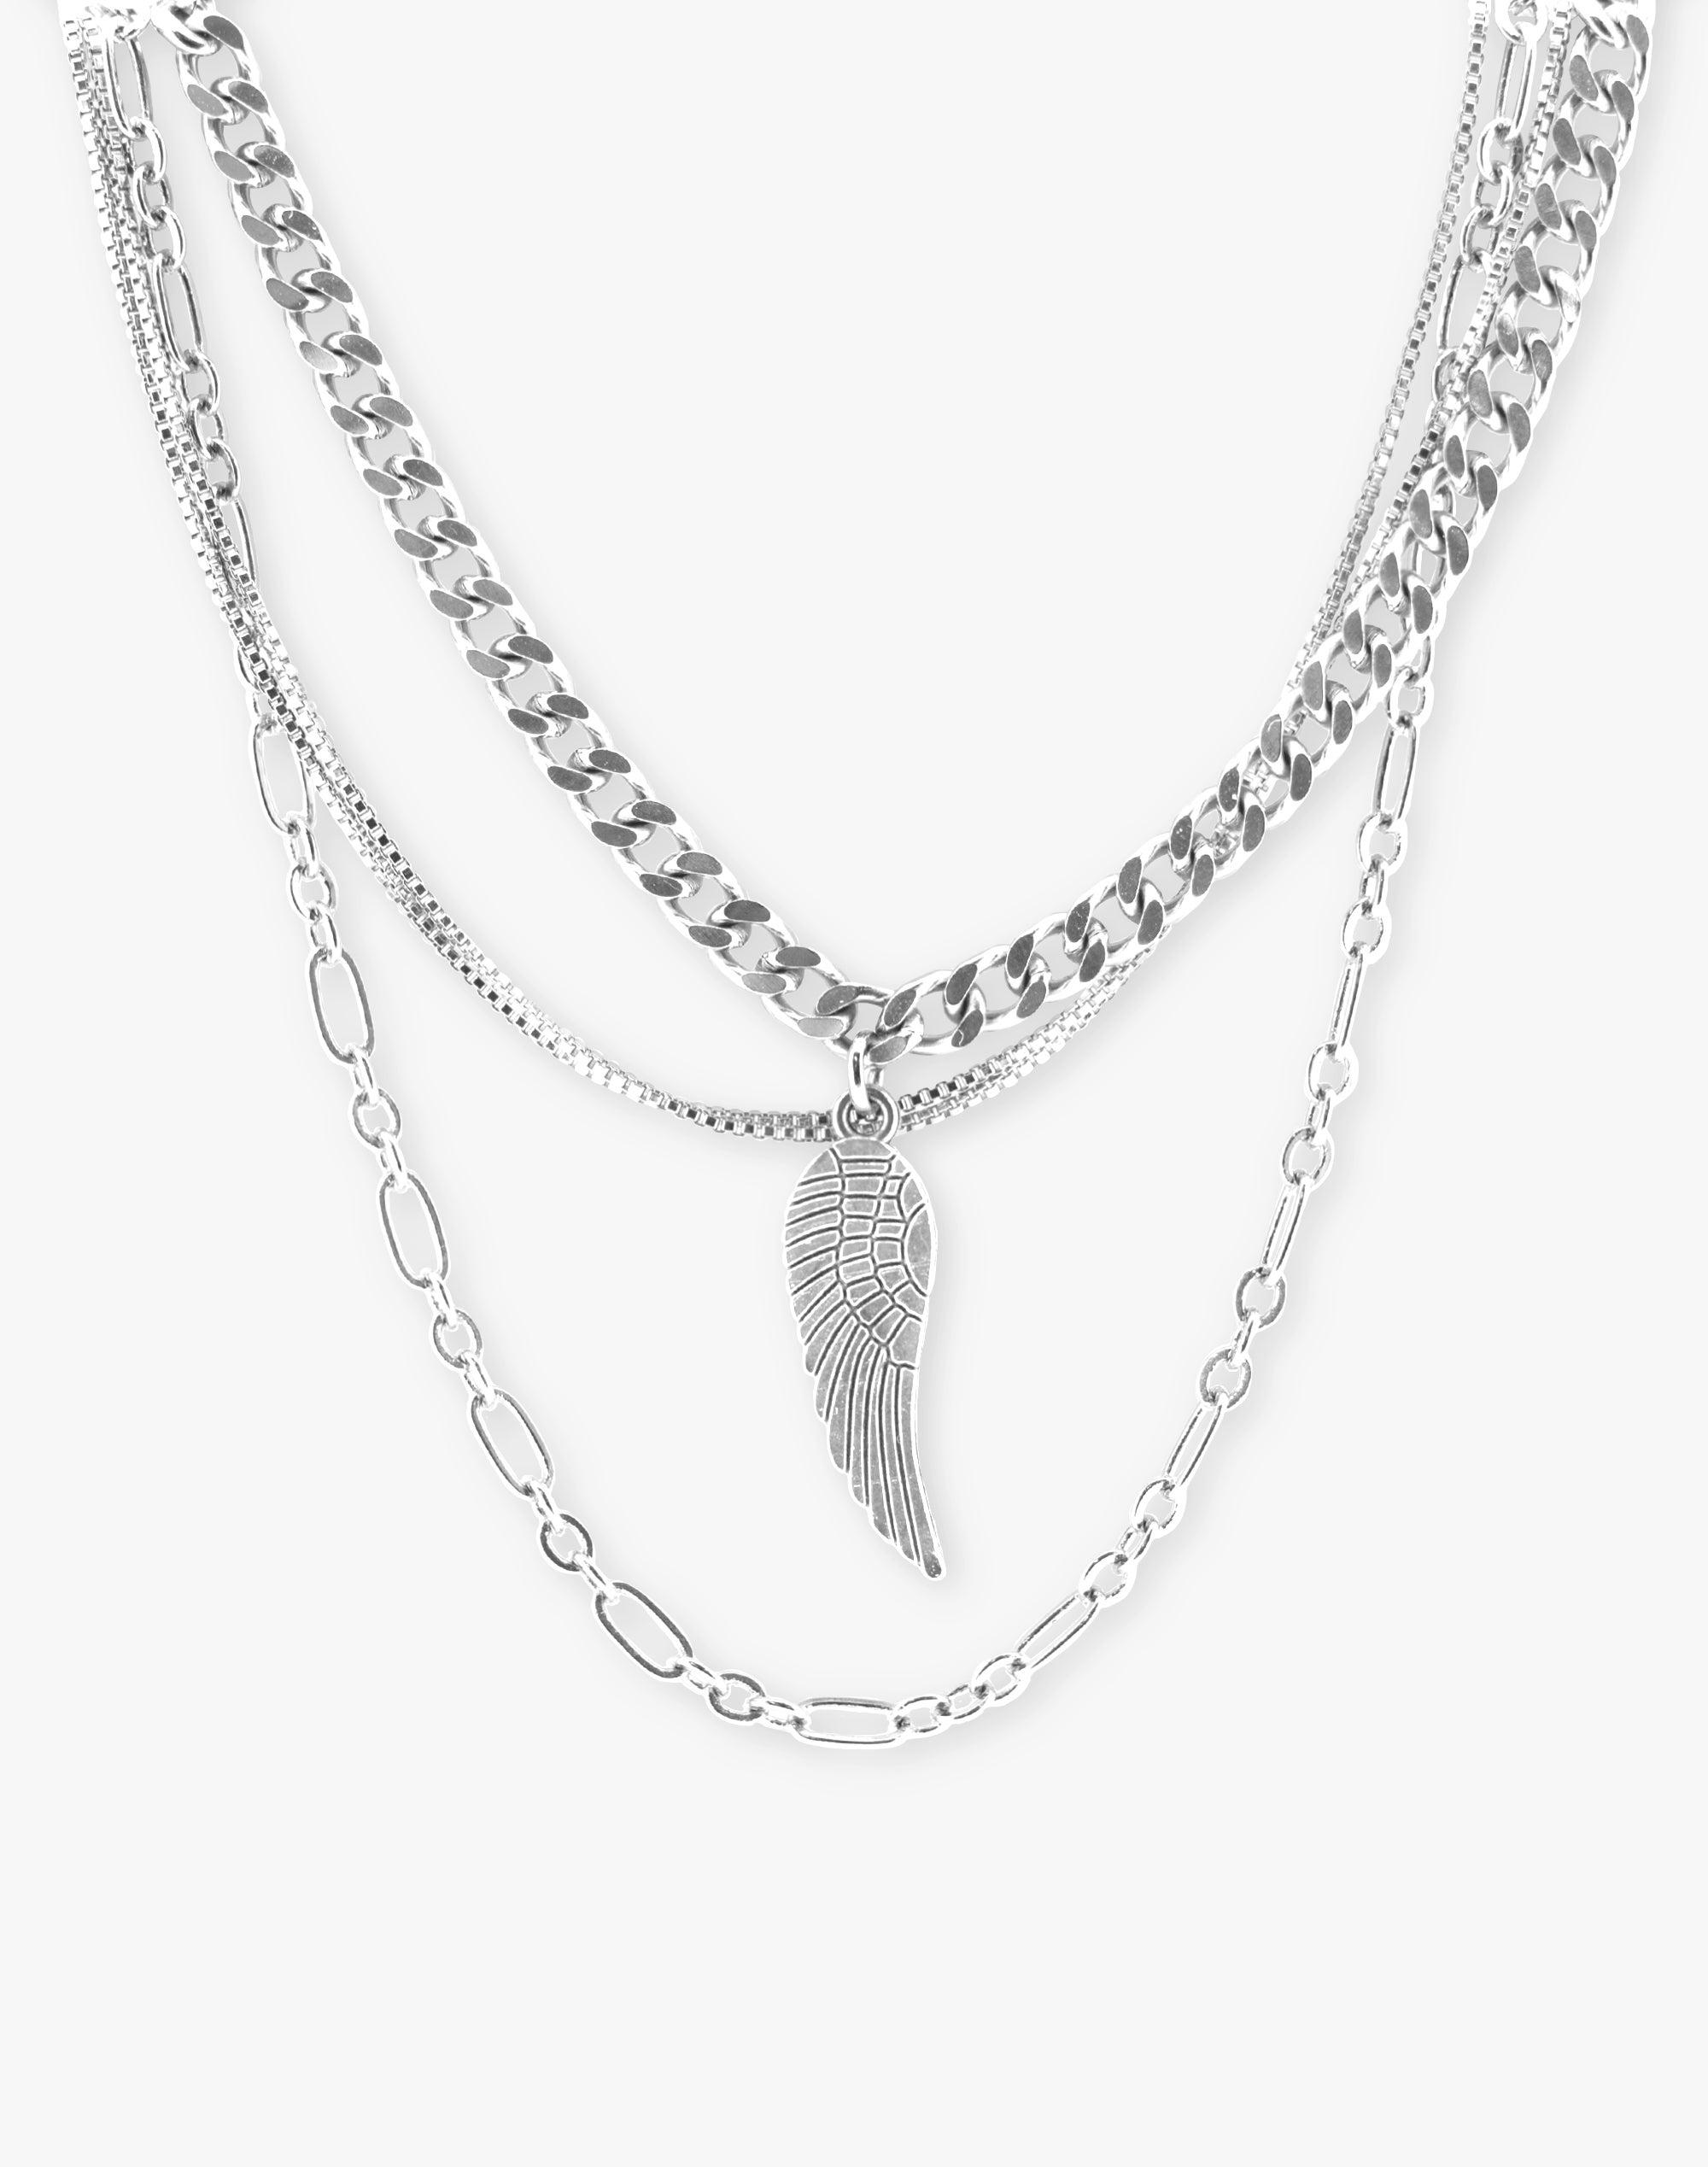 Narration Necklace